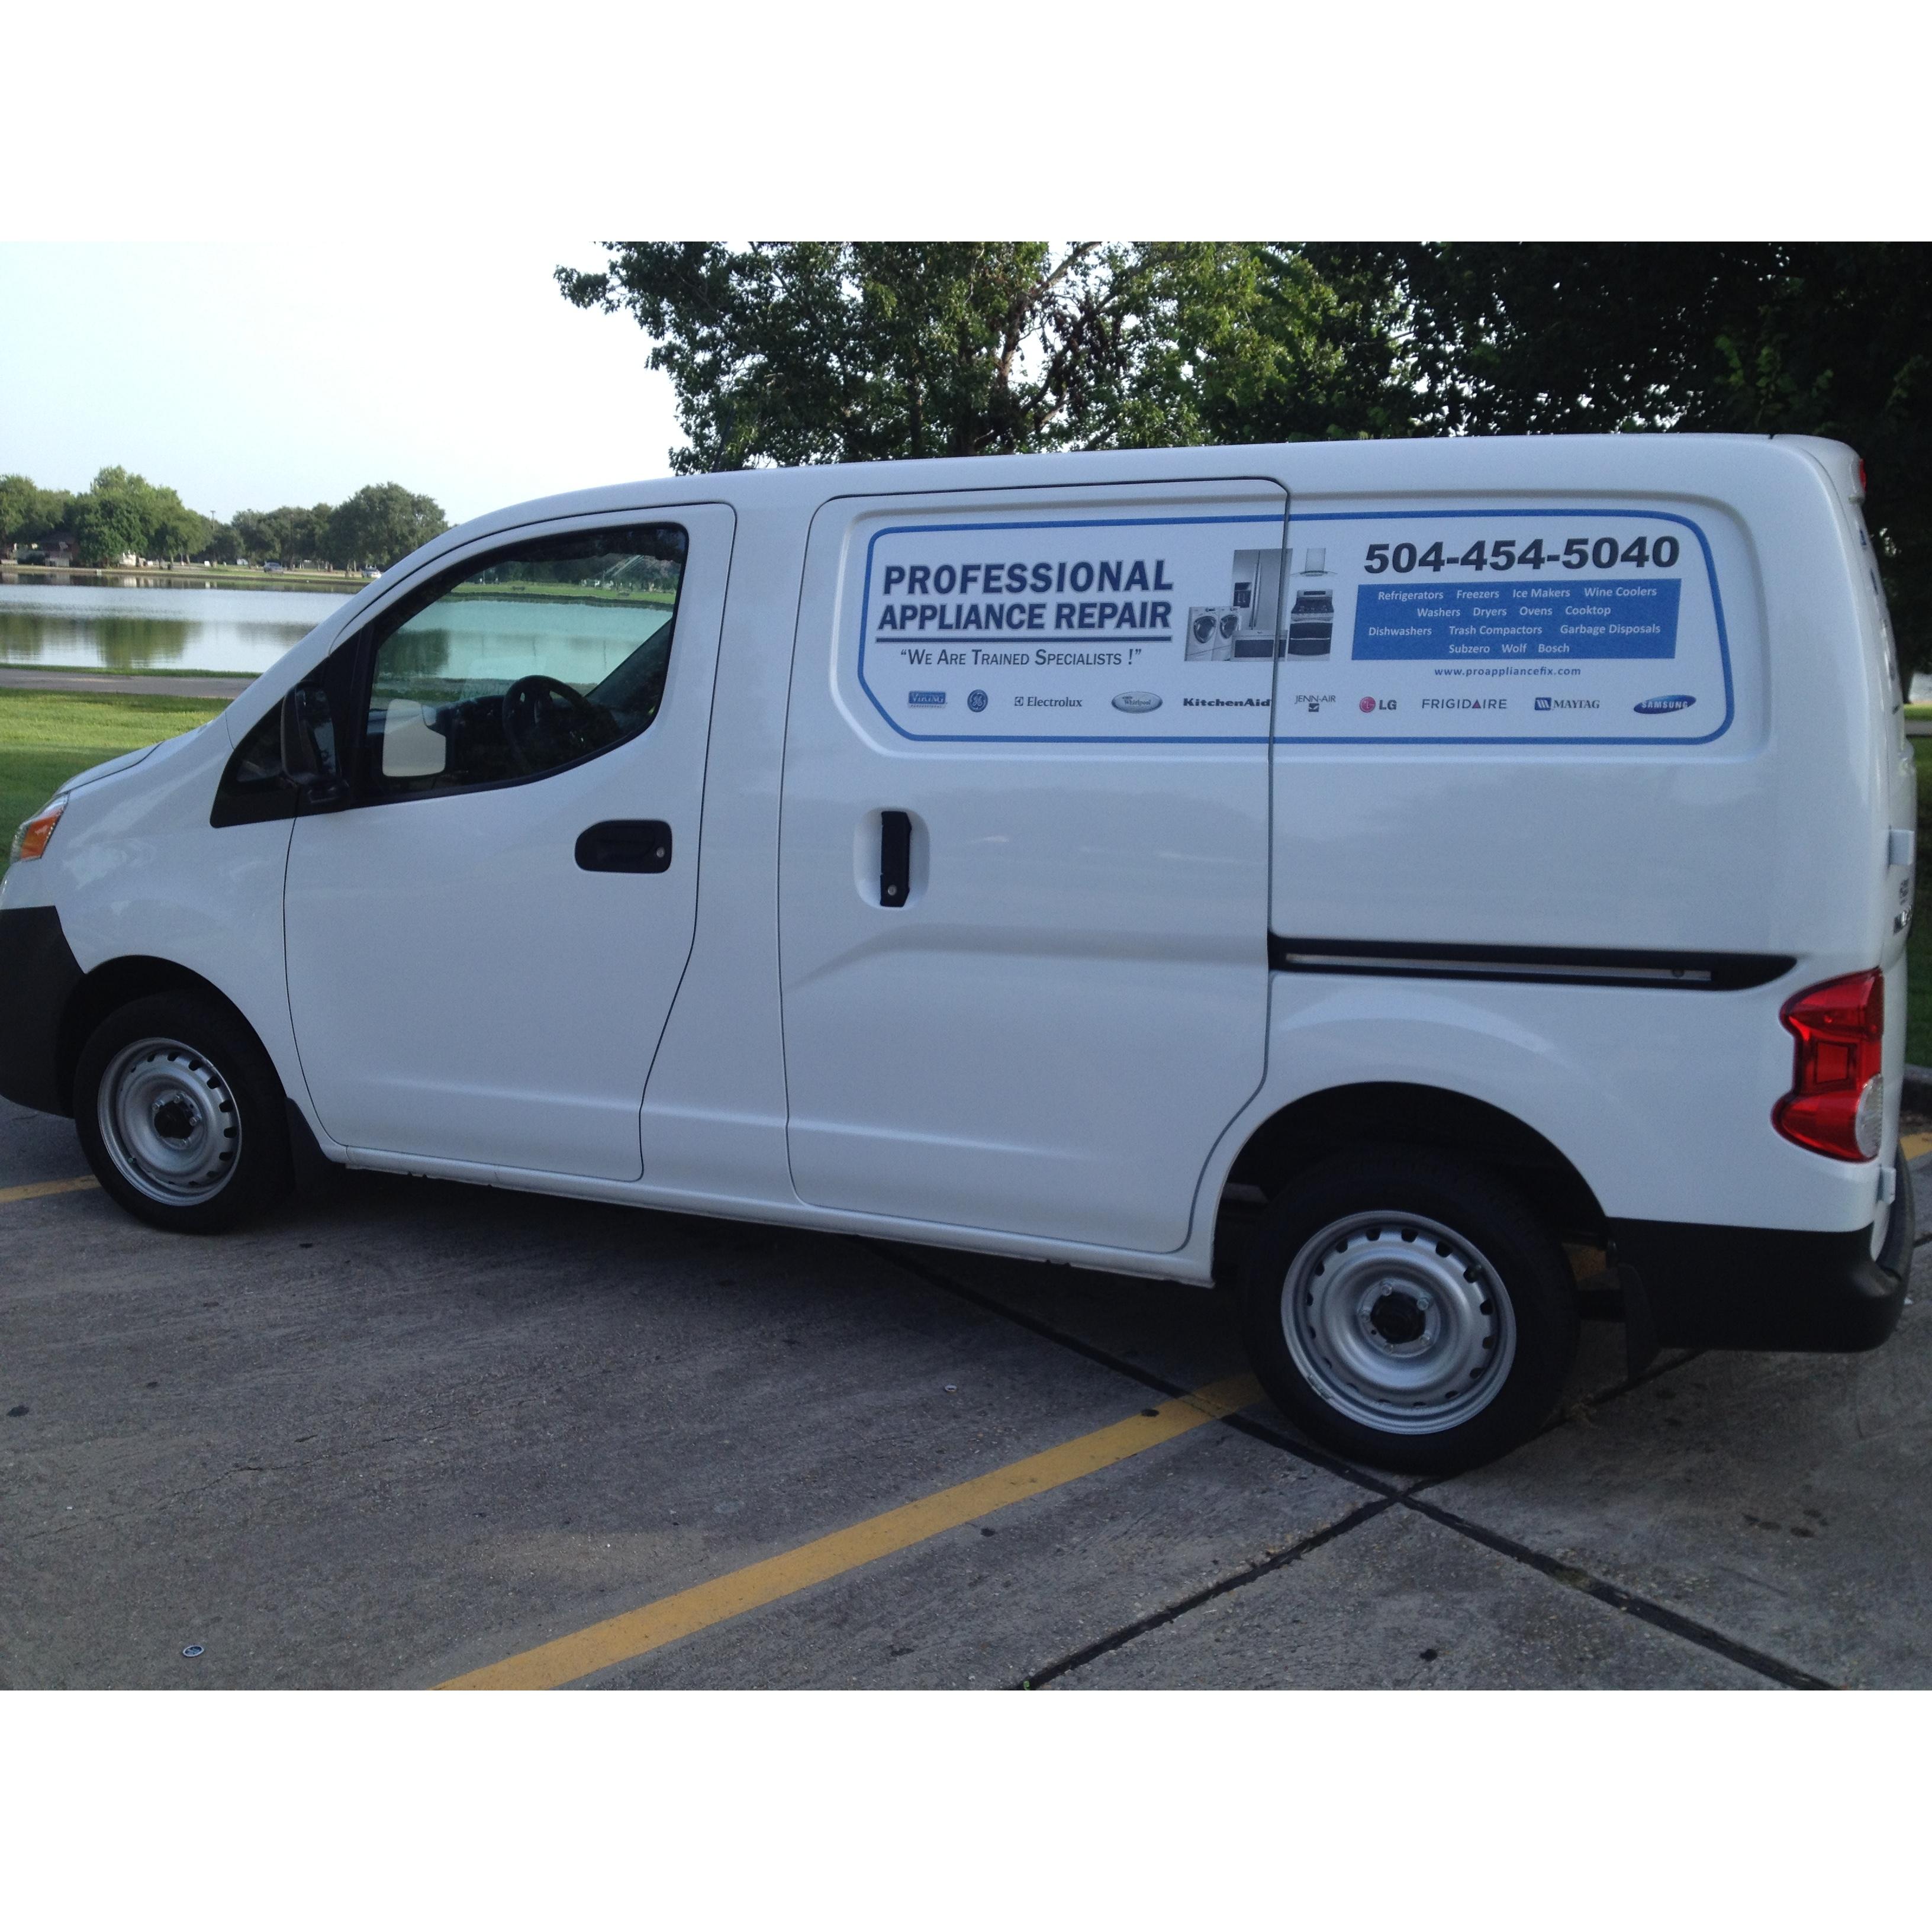 Professional Appliance Repair image 1